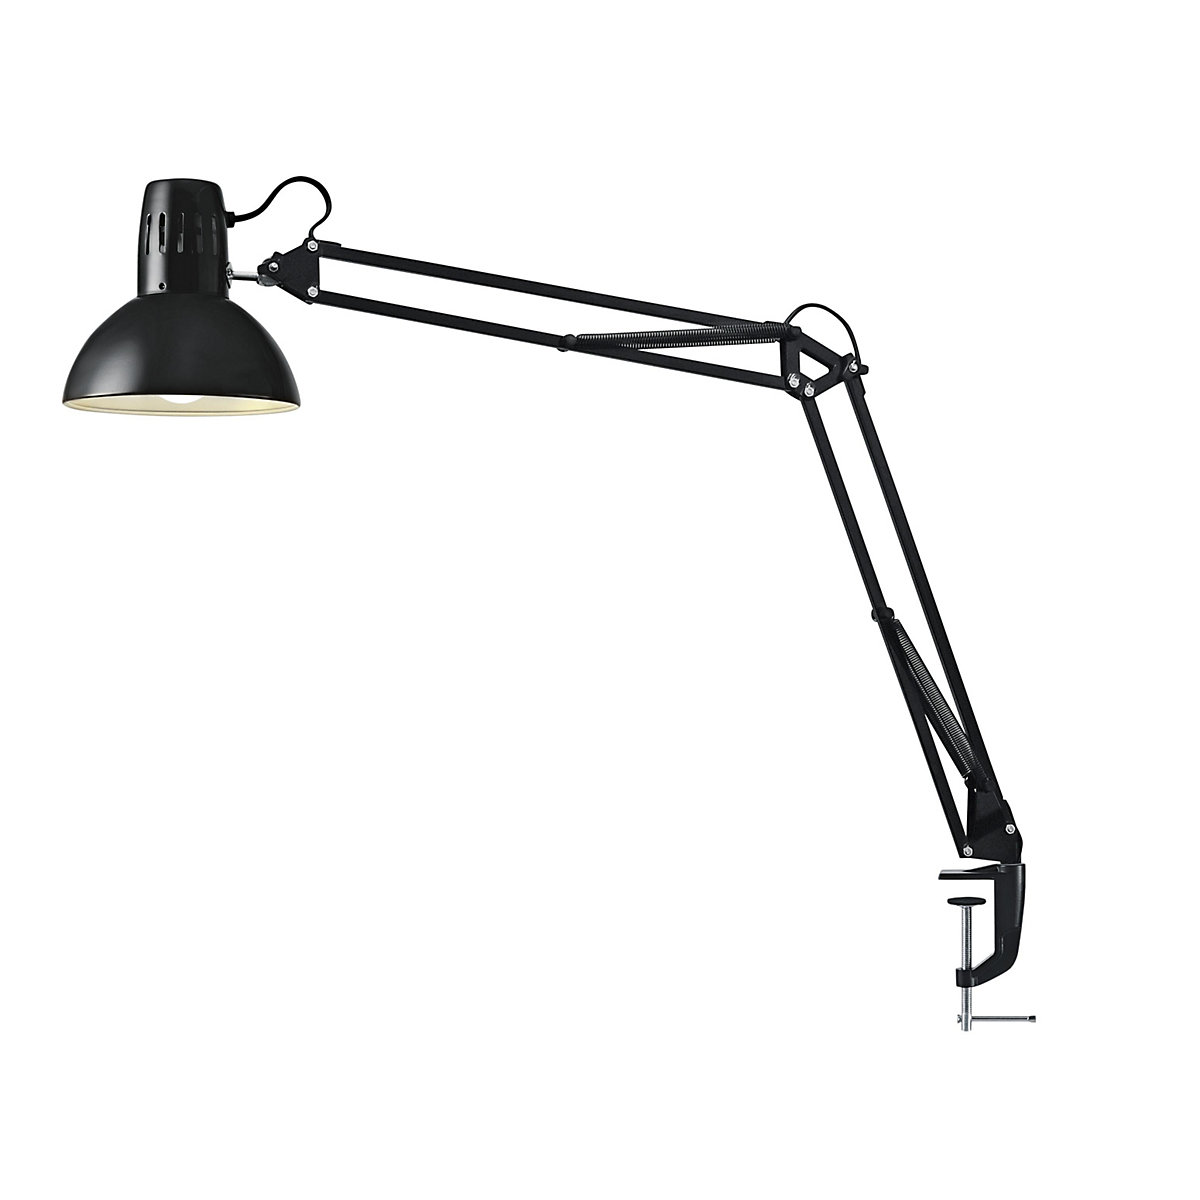 Hansa Manhattan Led Architect S Lamp With 5 W Led Bulb Kaiser Kraft International